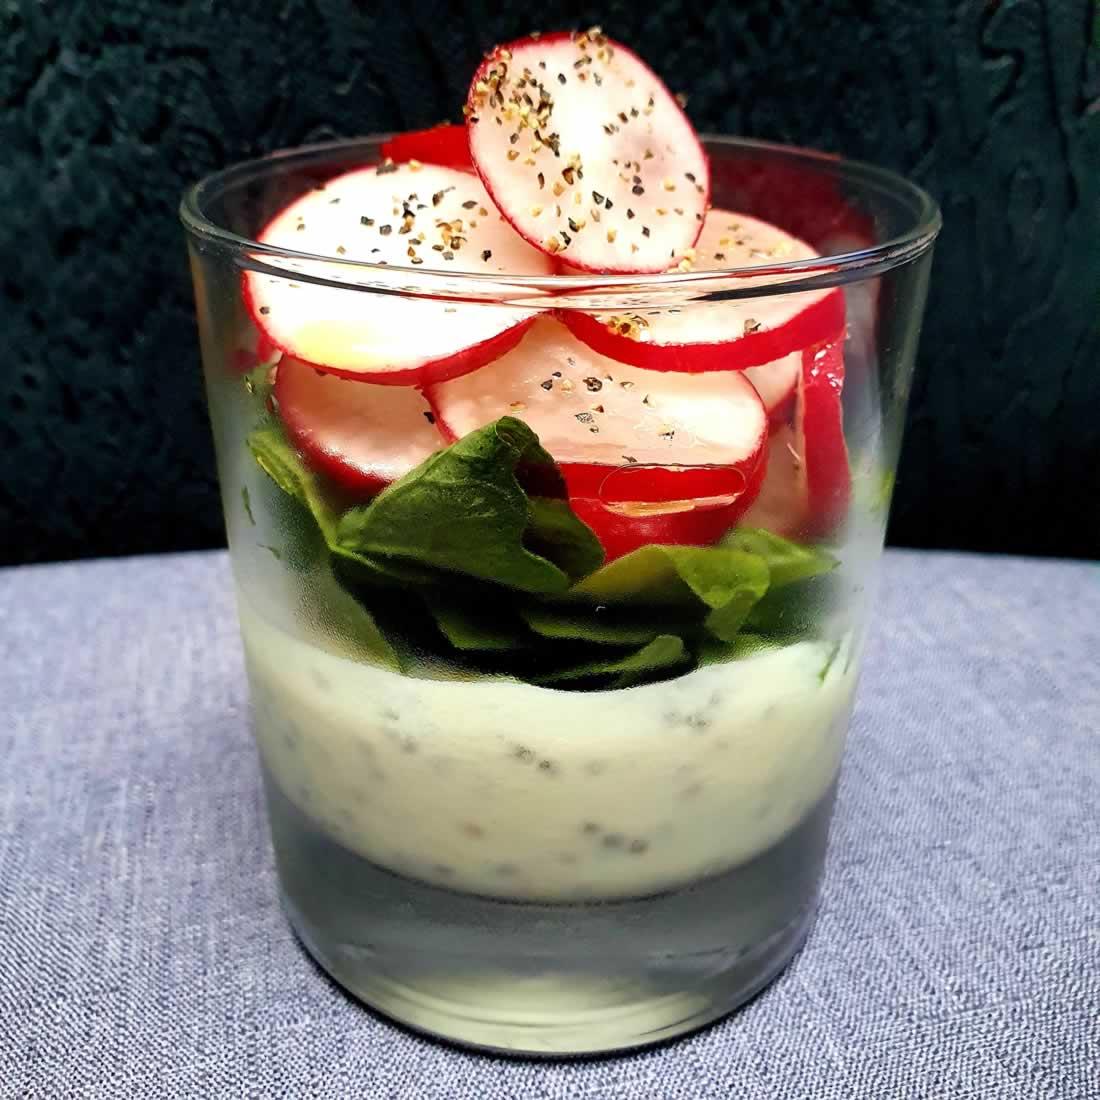 Verrines de radis et yaourt soja au wasabi